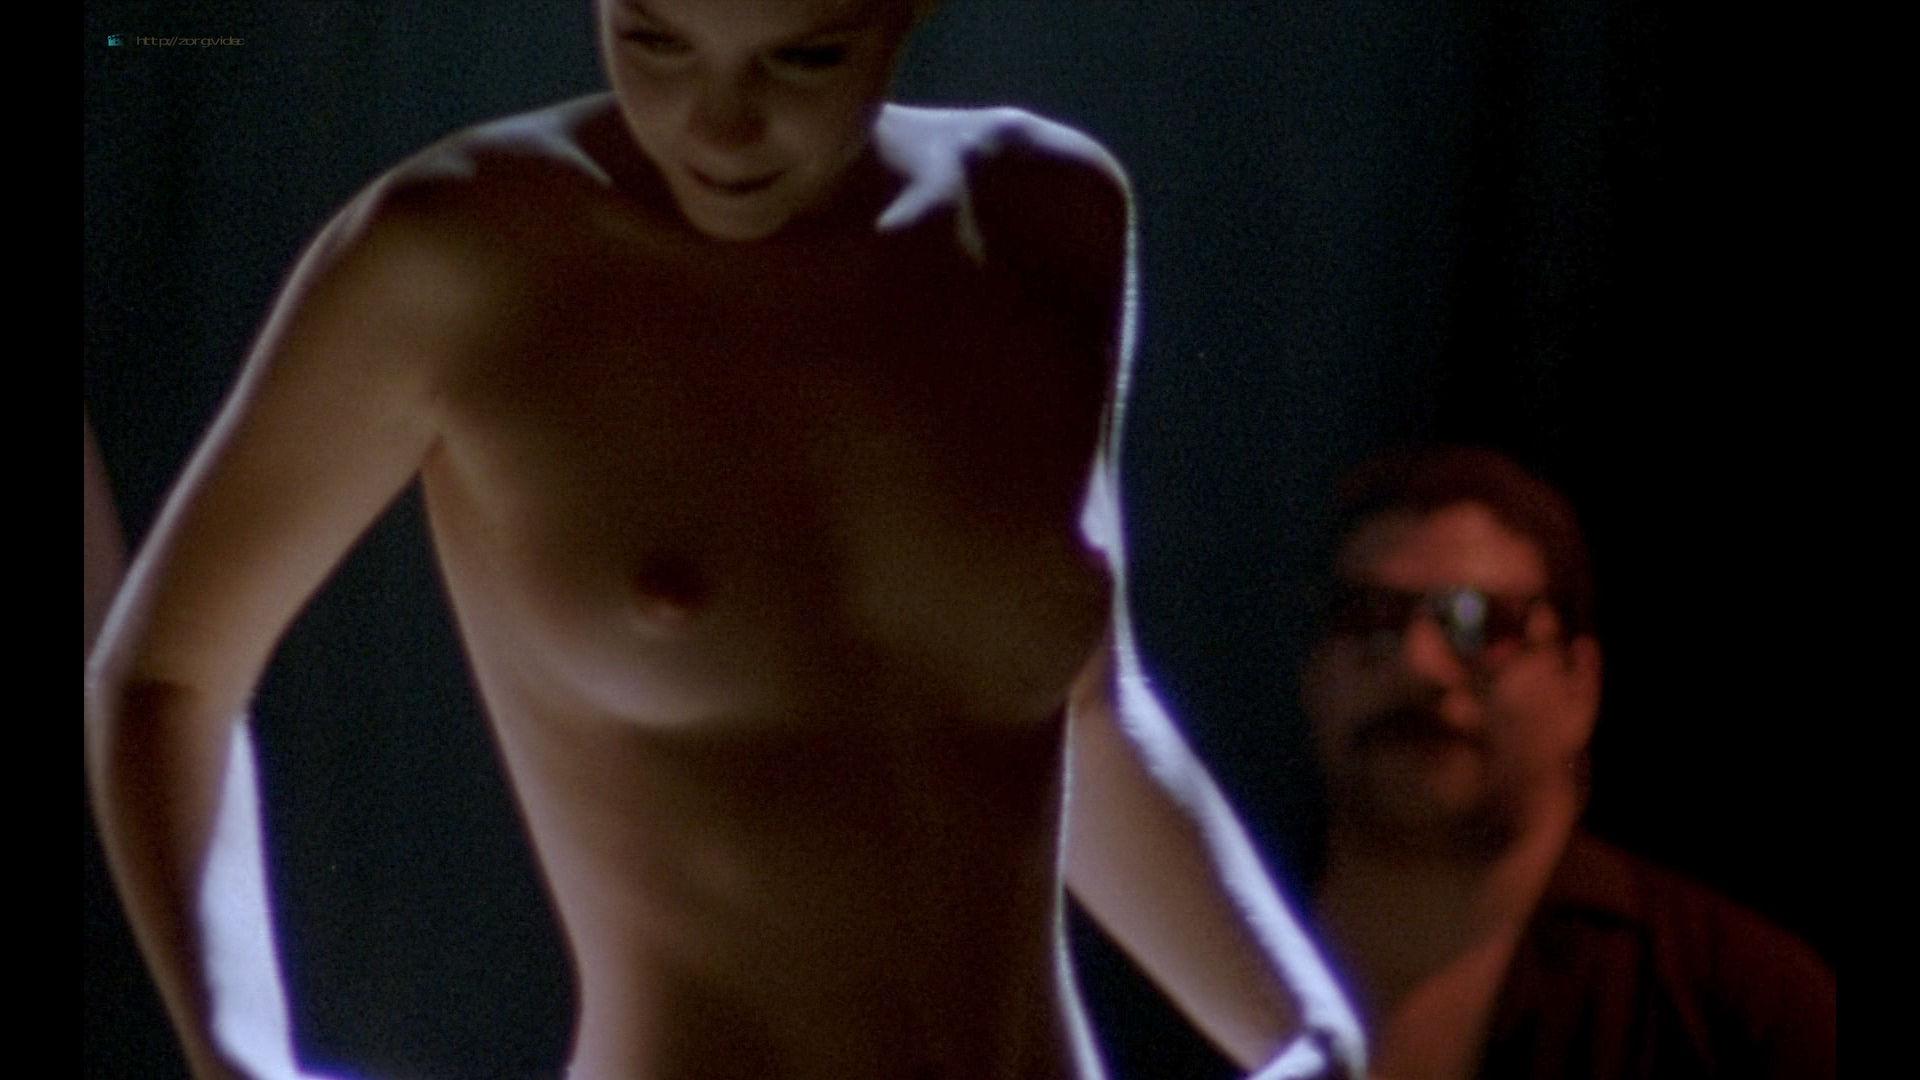 Elizabeth shue free nude photo xxx trends pics